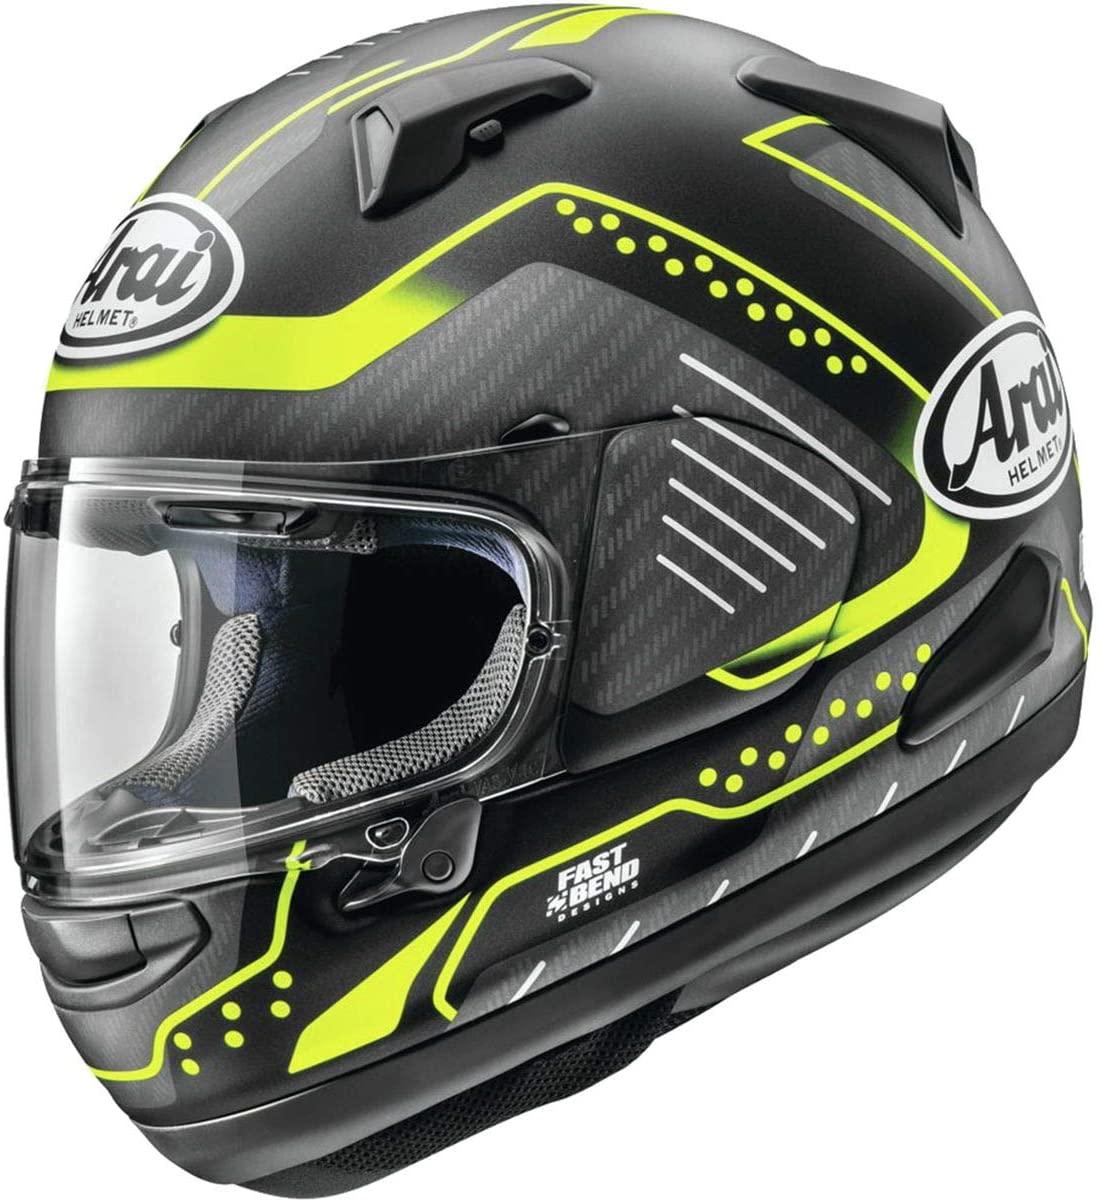 Arai Quantum X Helmet - Drone (Large) (Black/Yellow)